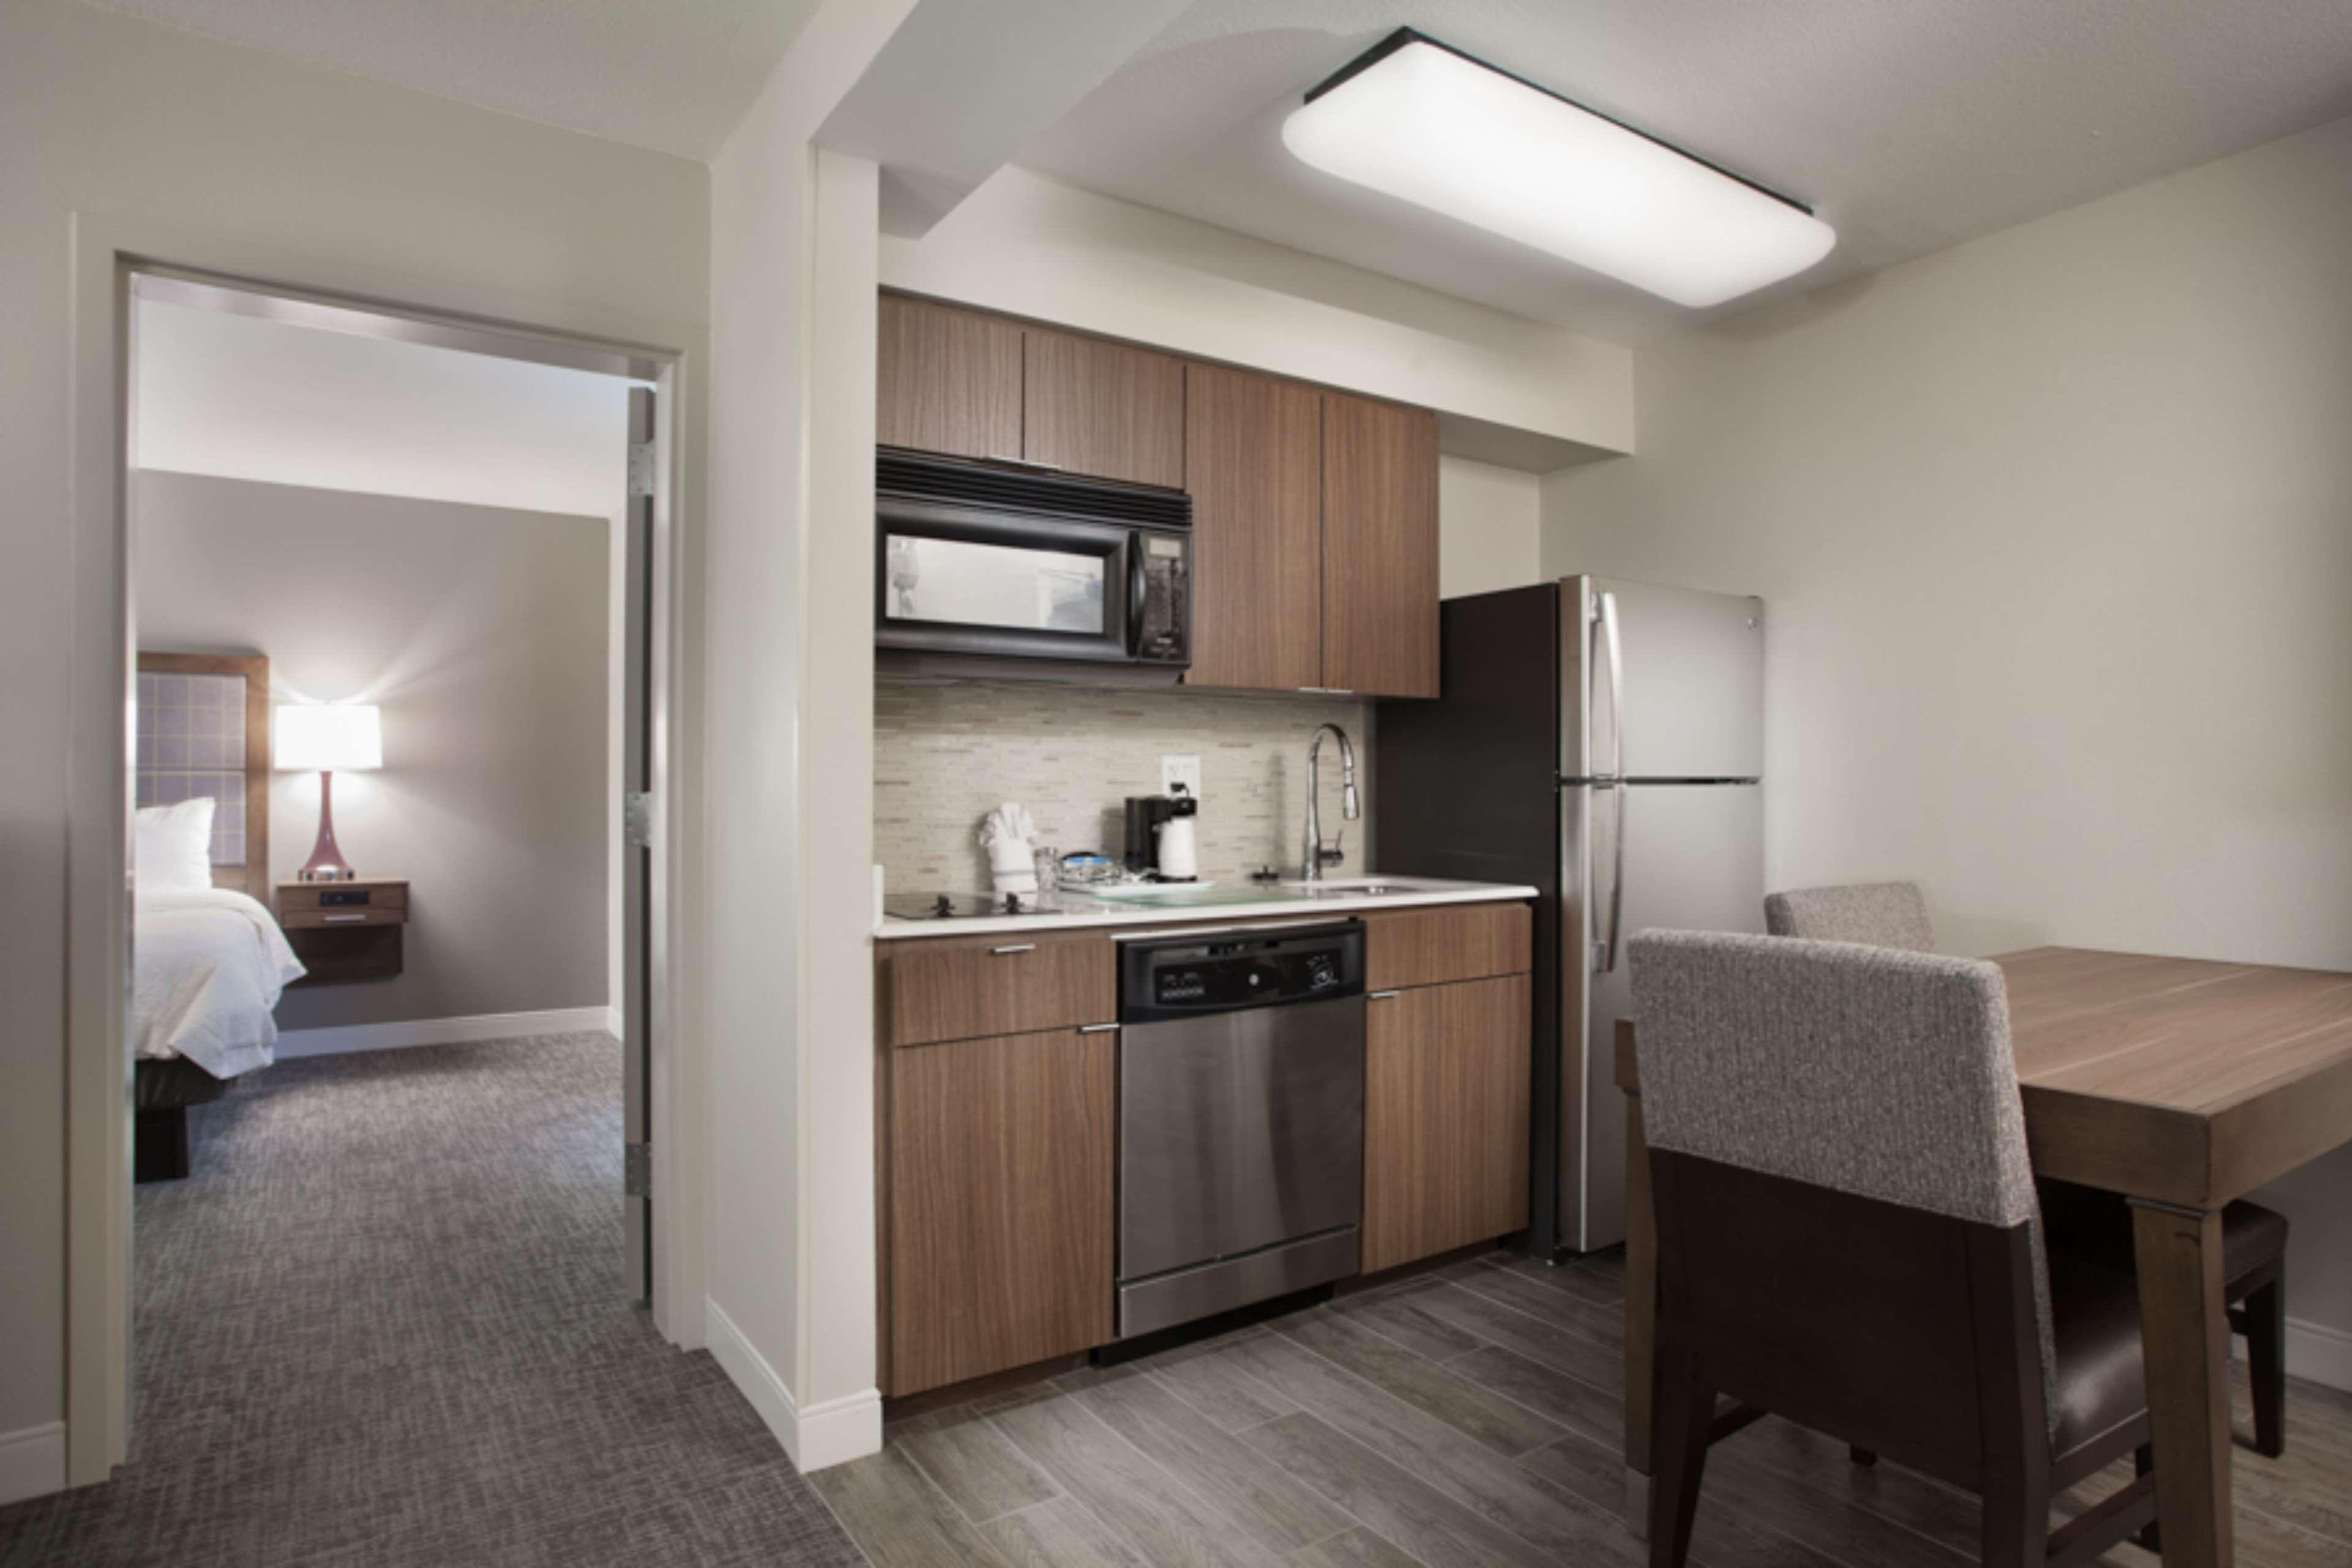 Hampton Inn & Suites Dallas-DFW Airport North-Grapevine image 20